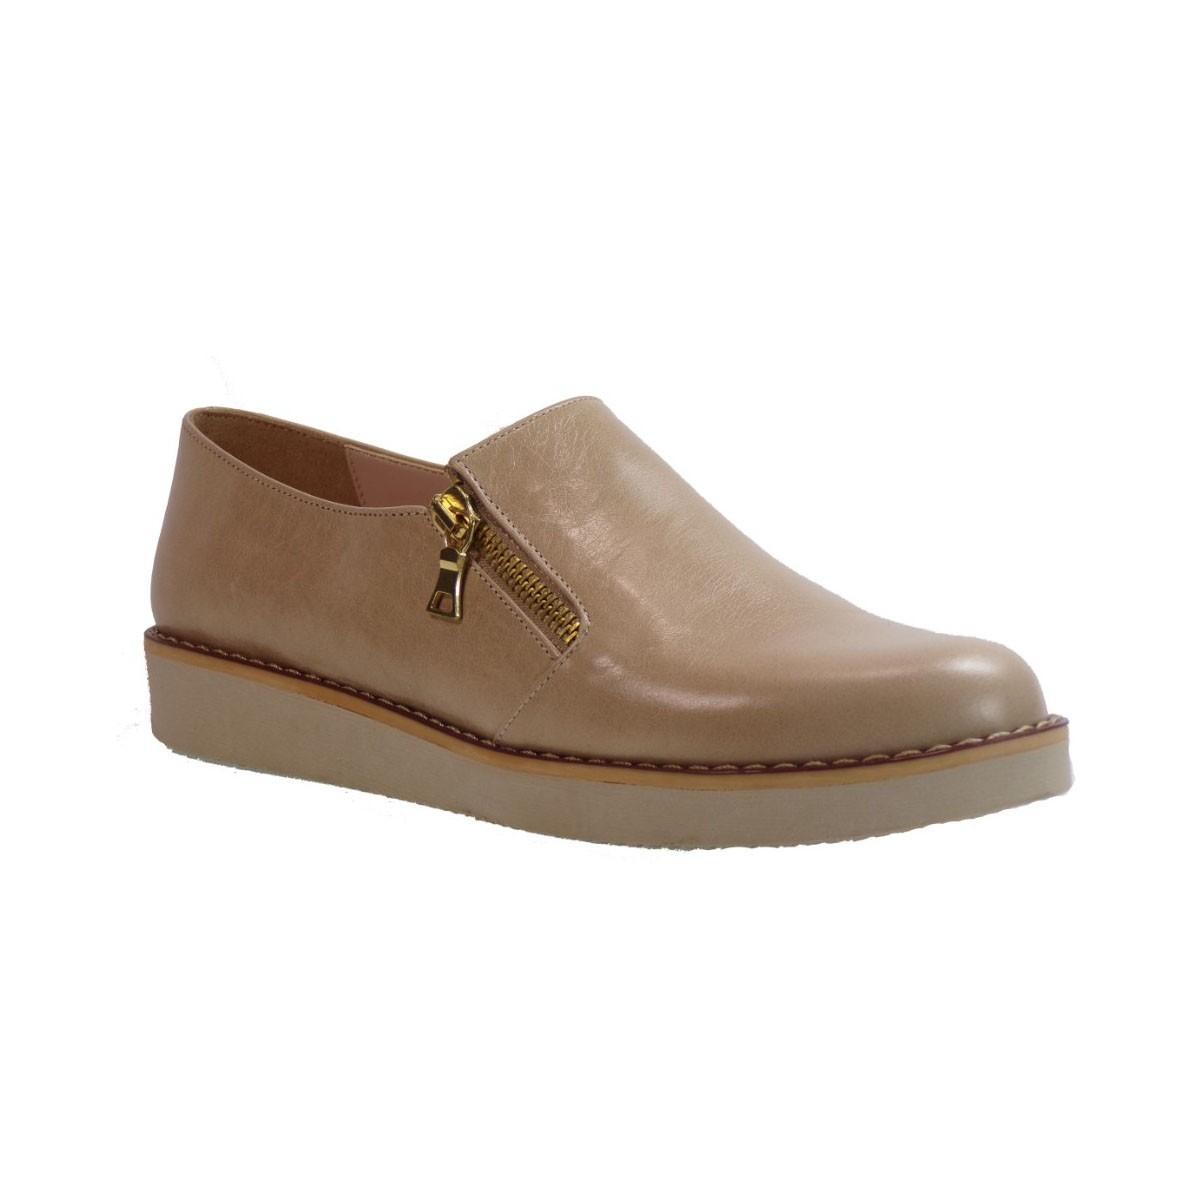 Moods Παπούτσια Γυναικεία 2134 Μπεζ Moods 2134 Μπεζ